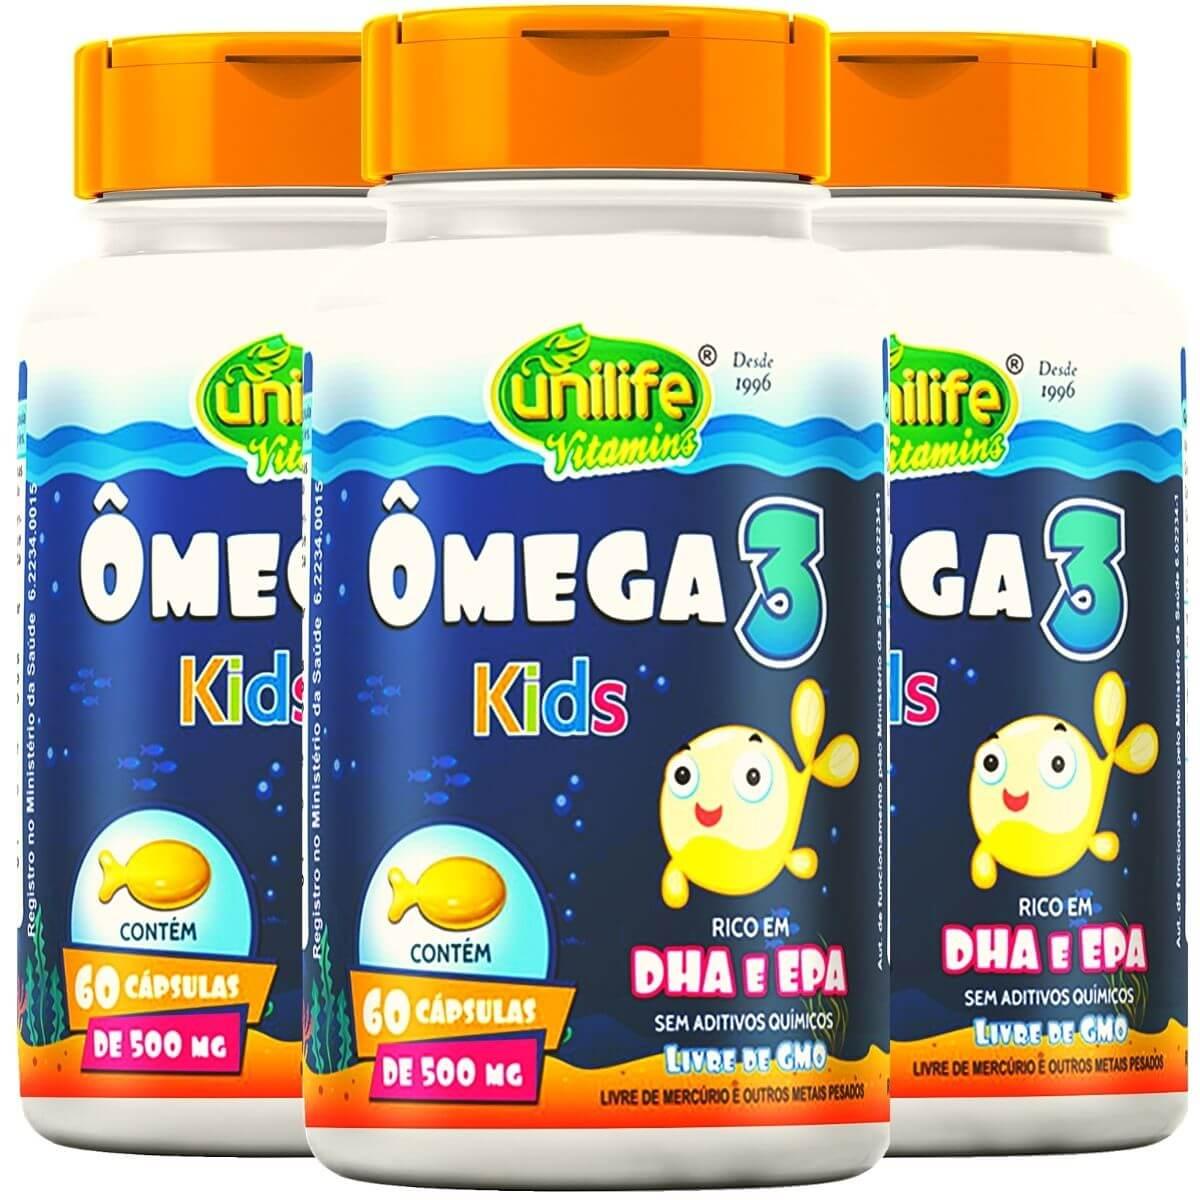 Kit 3 Ômega 3 Kids Unilife 60 Cápsulas 500mg